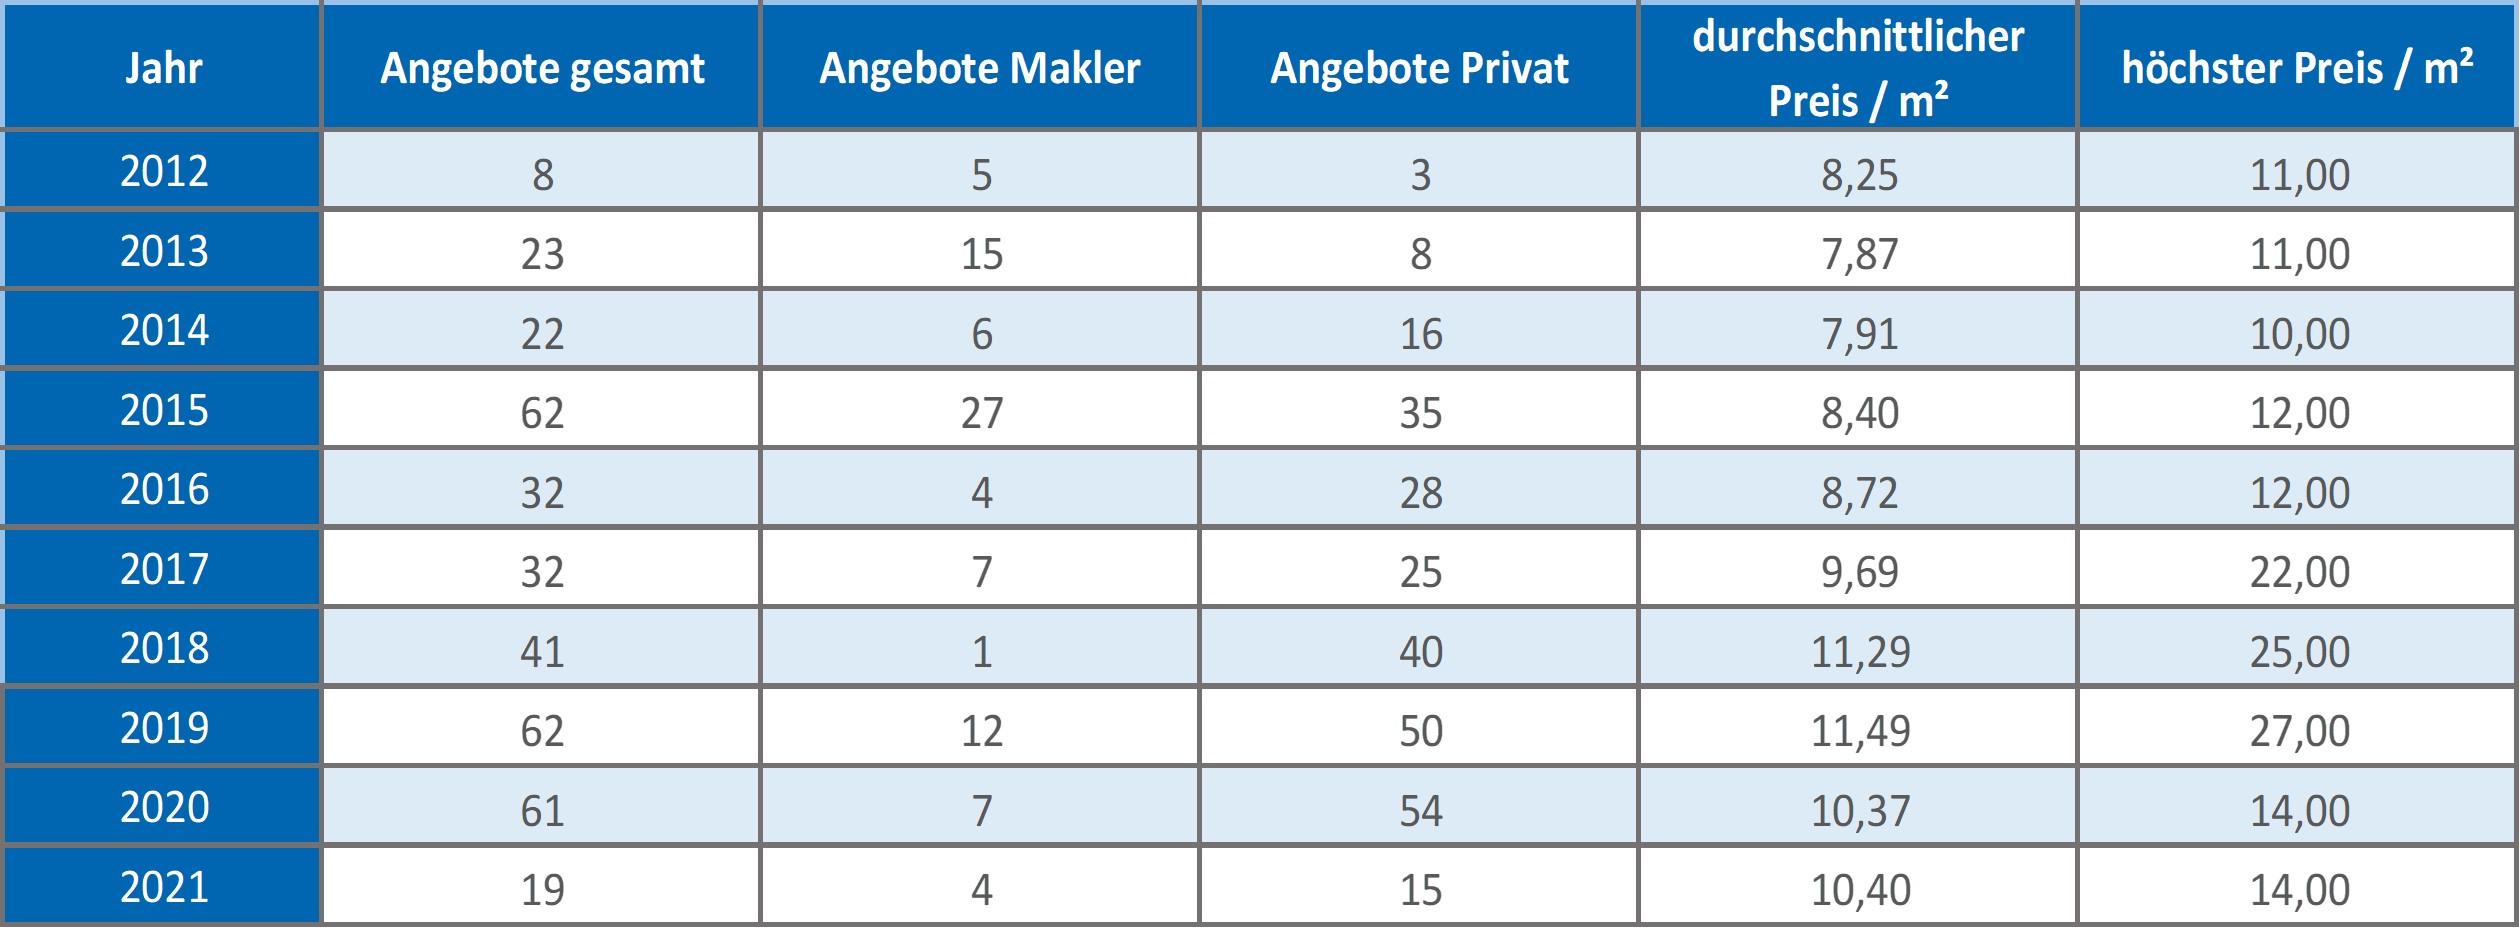 Aßling-Wohnung-Haus-mieten-vermieten-Makler 2019, 2020, 2021